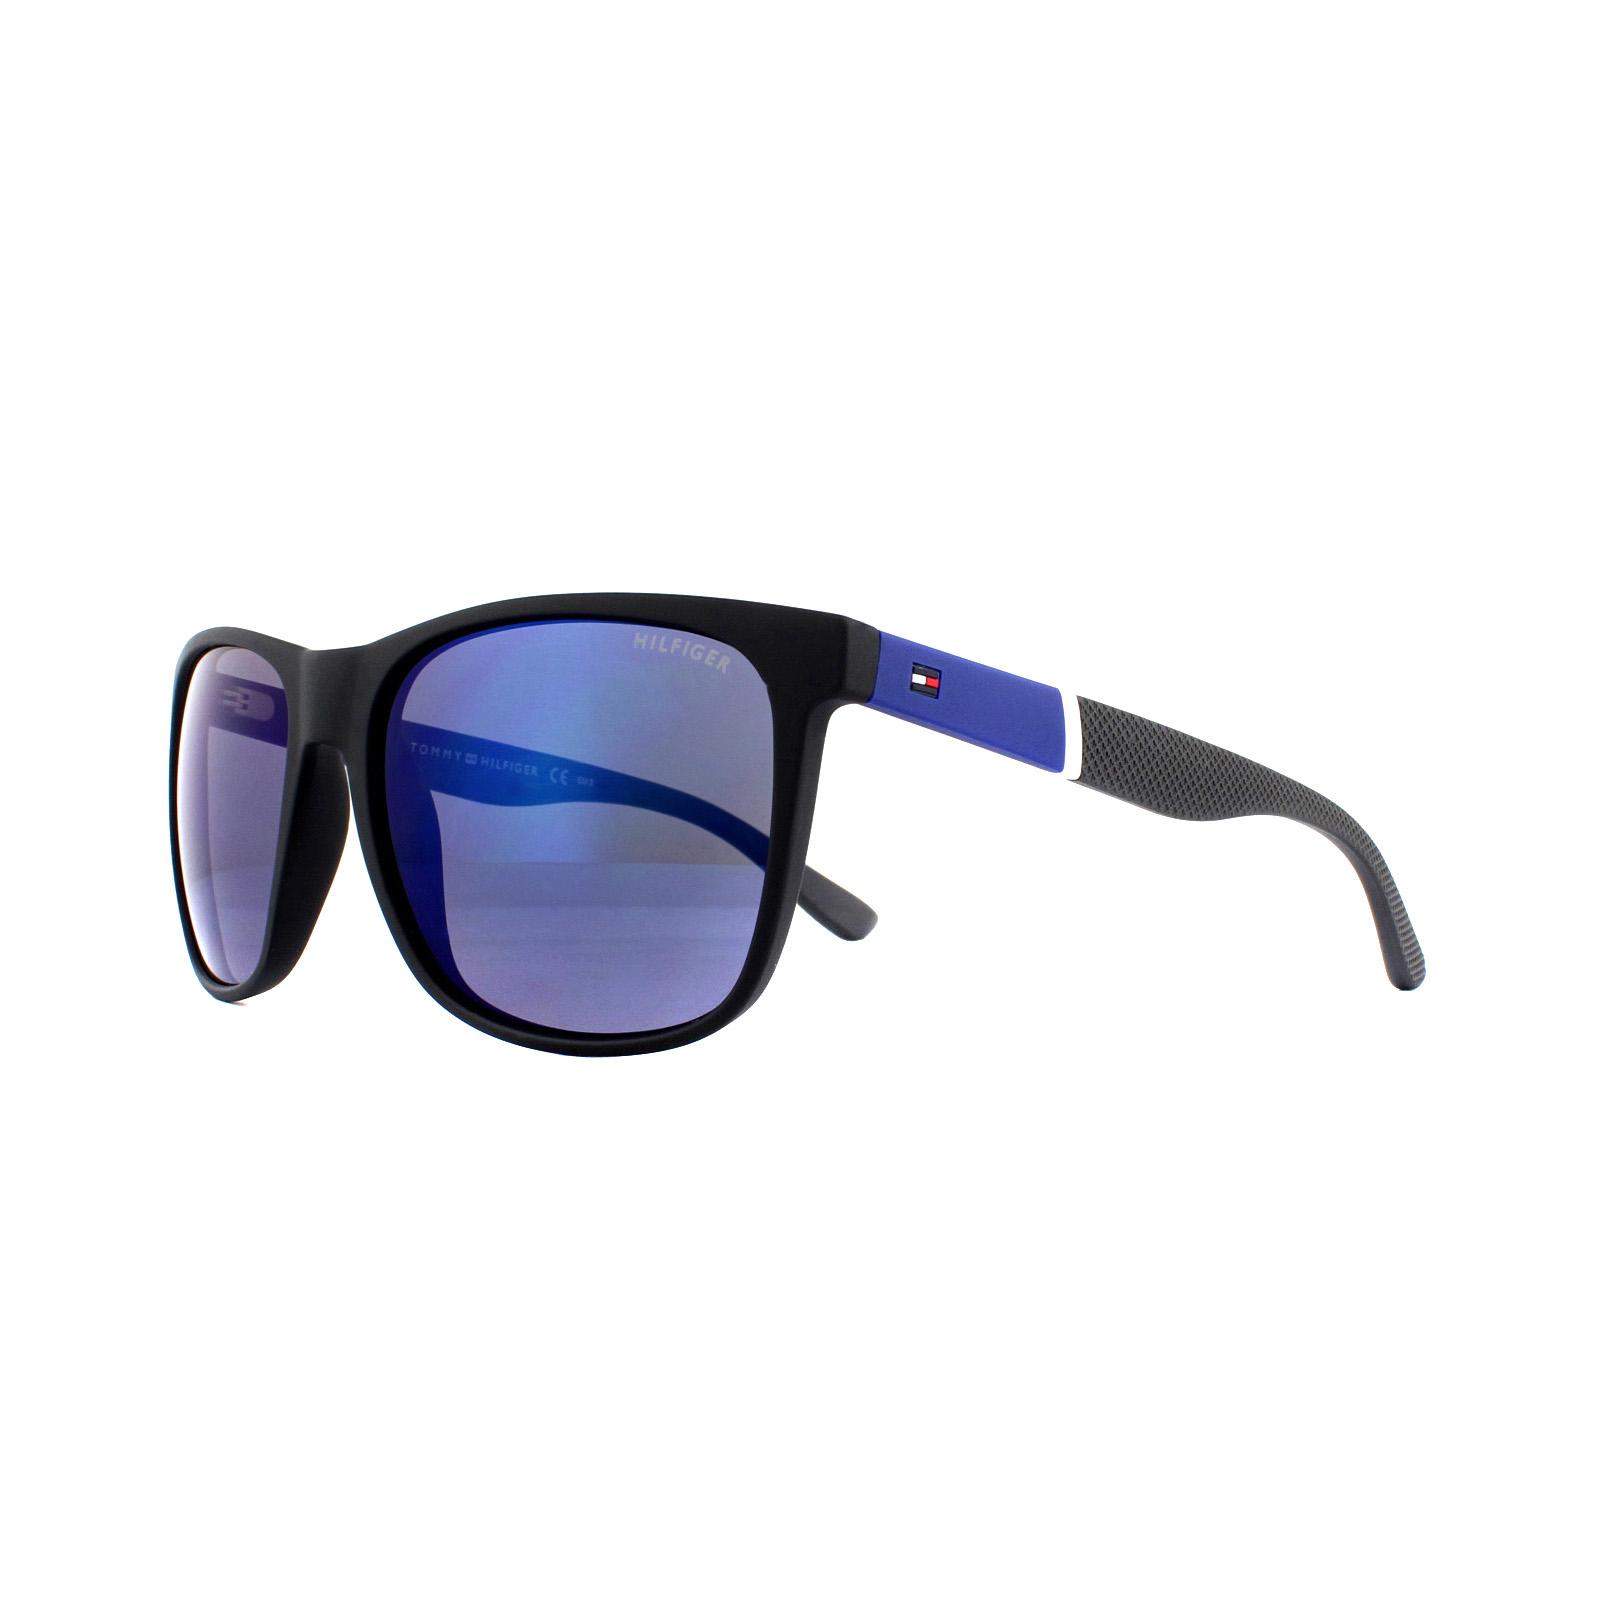 b3c251dcbe388 Sentinel Tommy Hilfiger Sunglasses TH 1281 S FMA 3H Black Blue Grey  Polarized